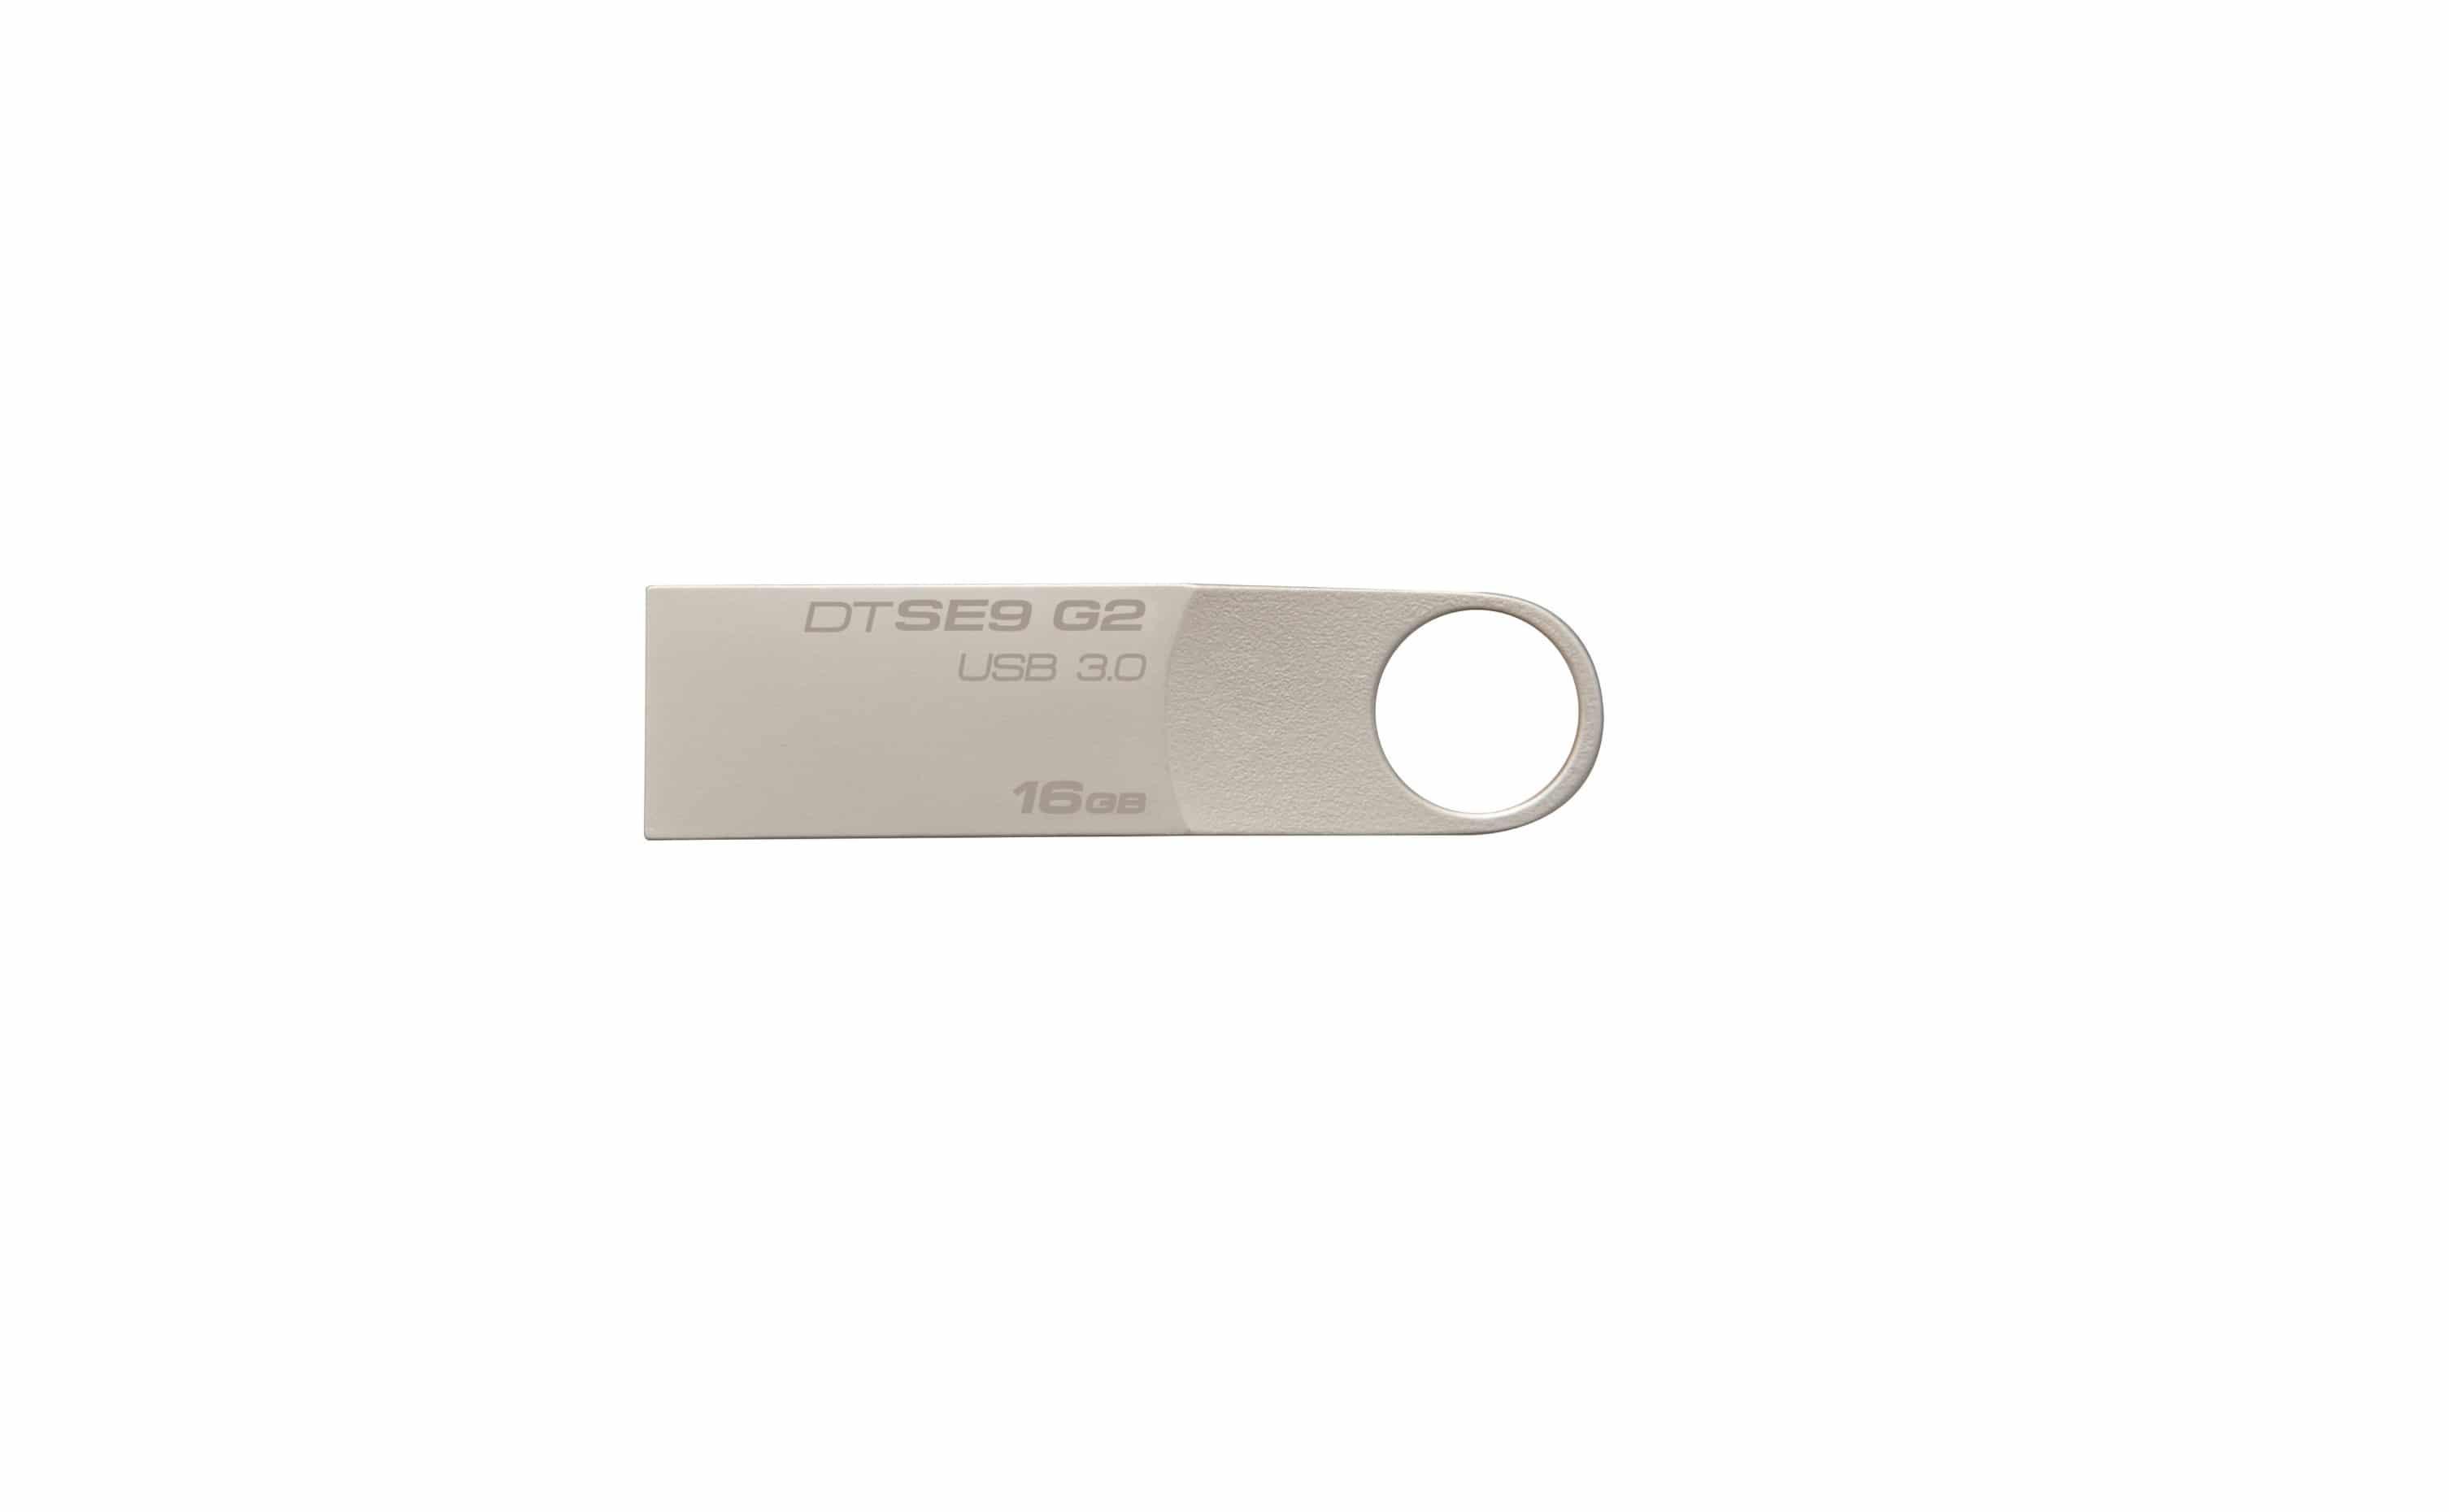 16gb Kingston Datatraveler Se9 G2 30 Dtse9g2 Bulk Memory Cards Sandisk Flashdisk 16 Gb Cruzer Blade Original Usb